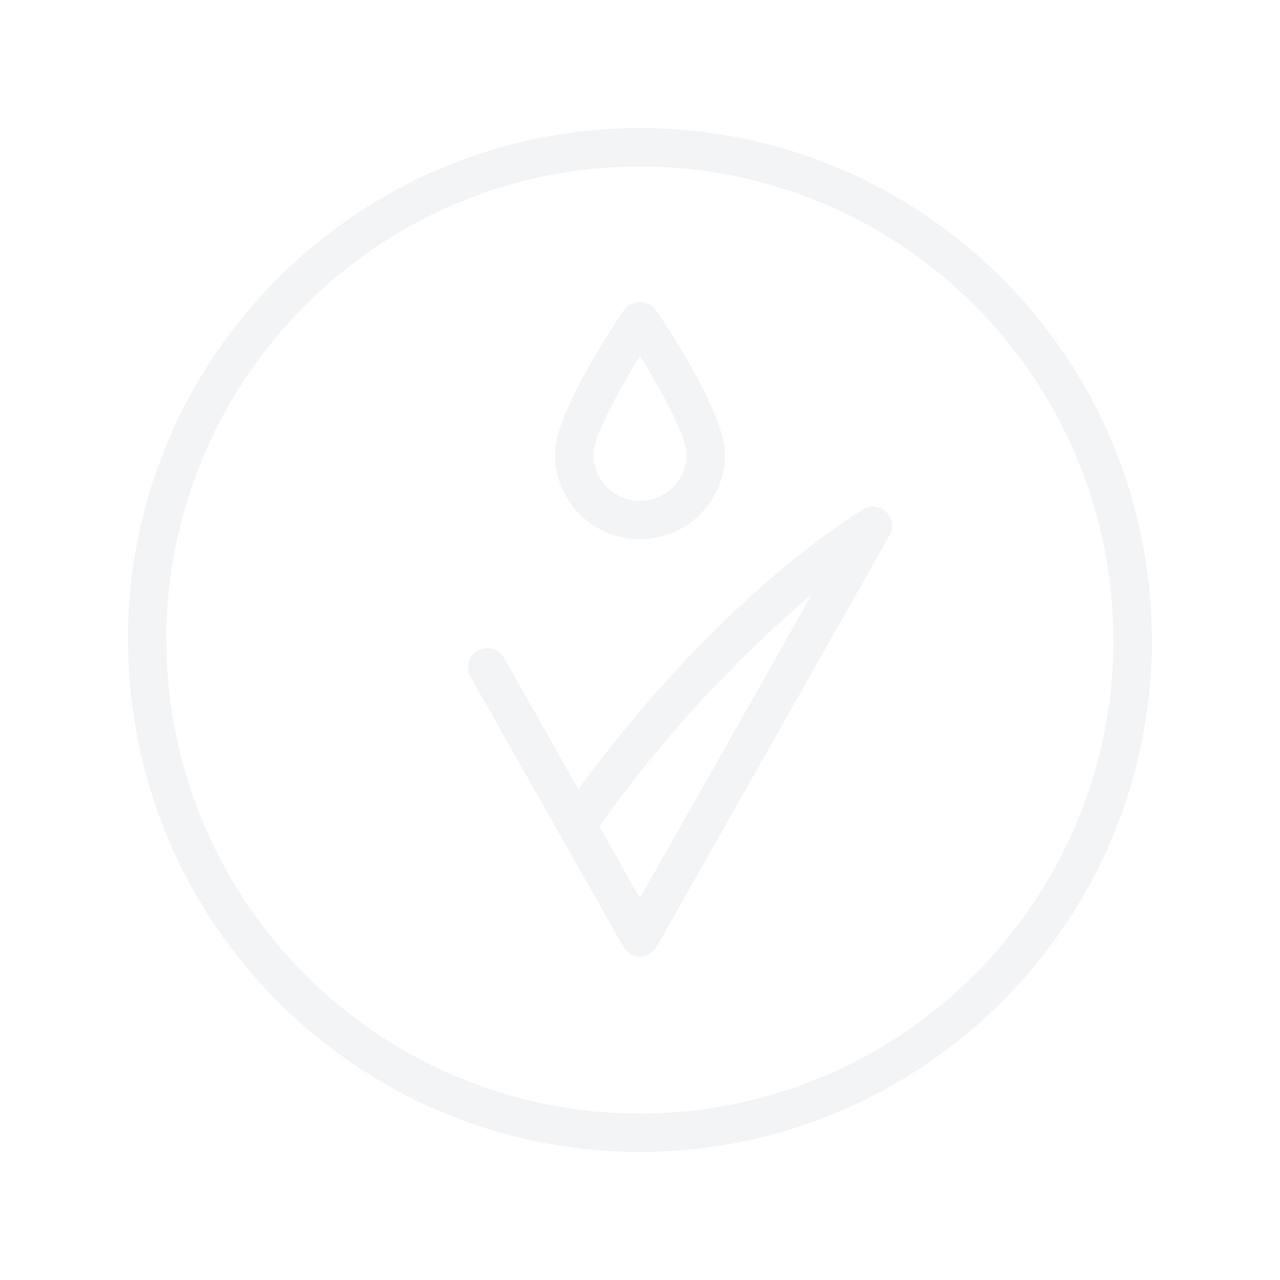 ROBERTO CAVALLI 30ml Eau De Parfum Gift Set